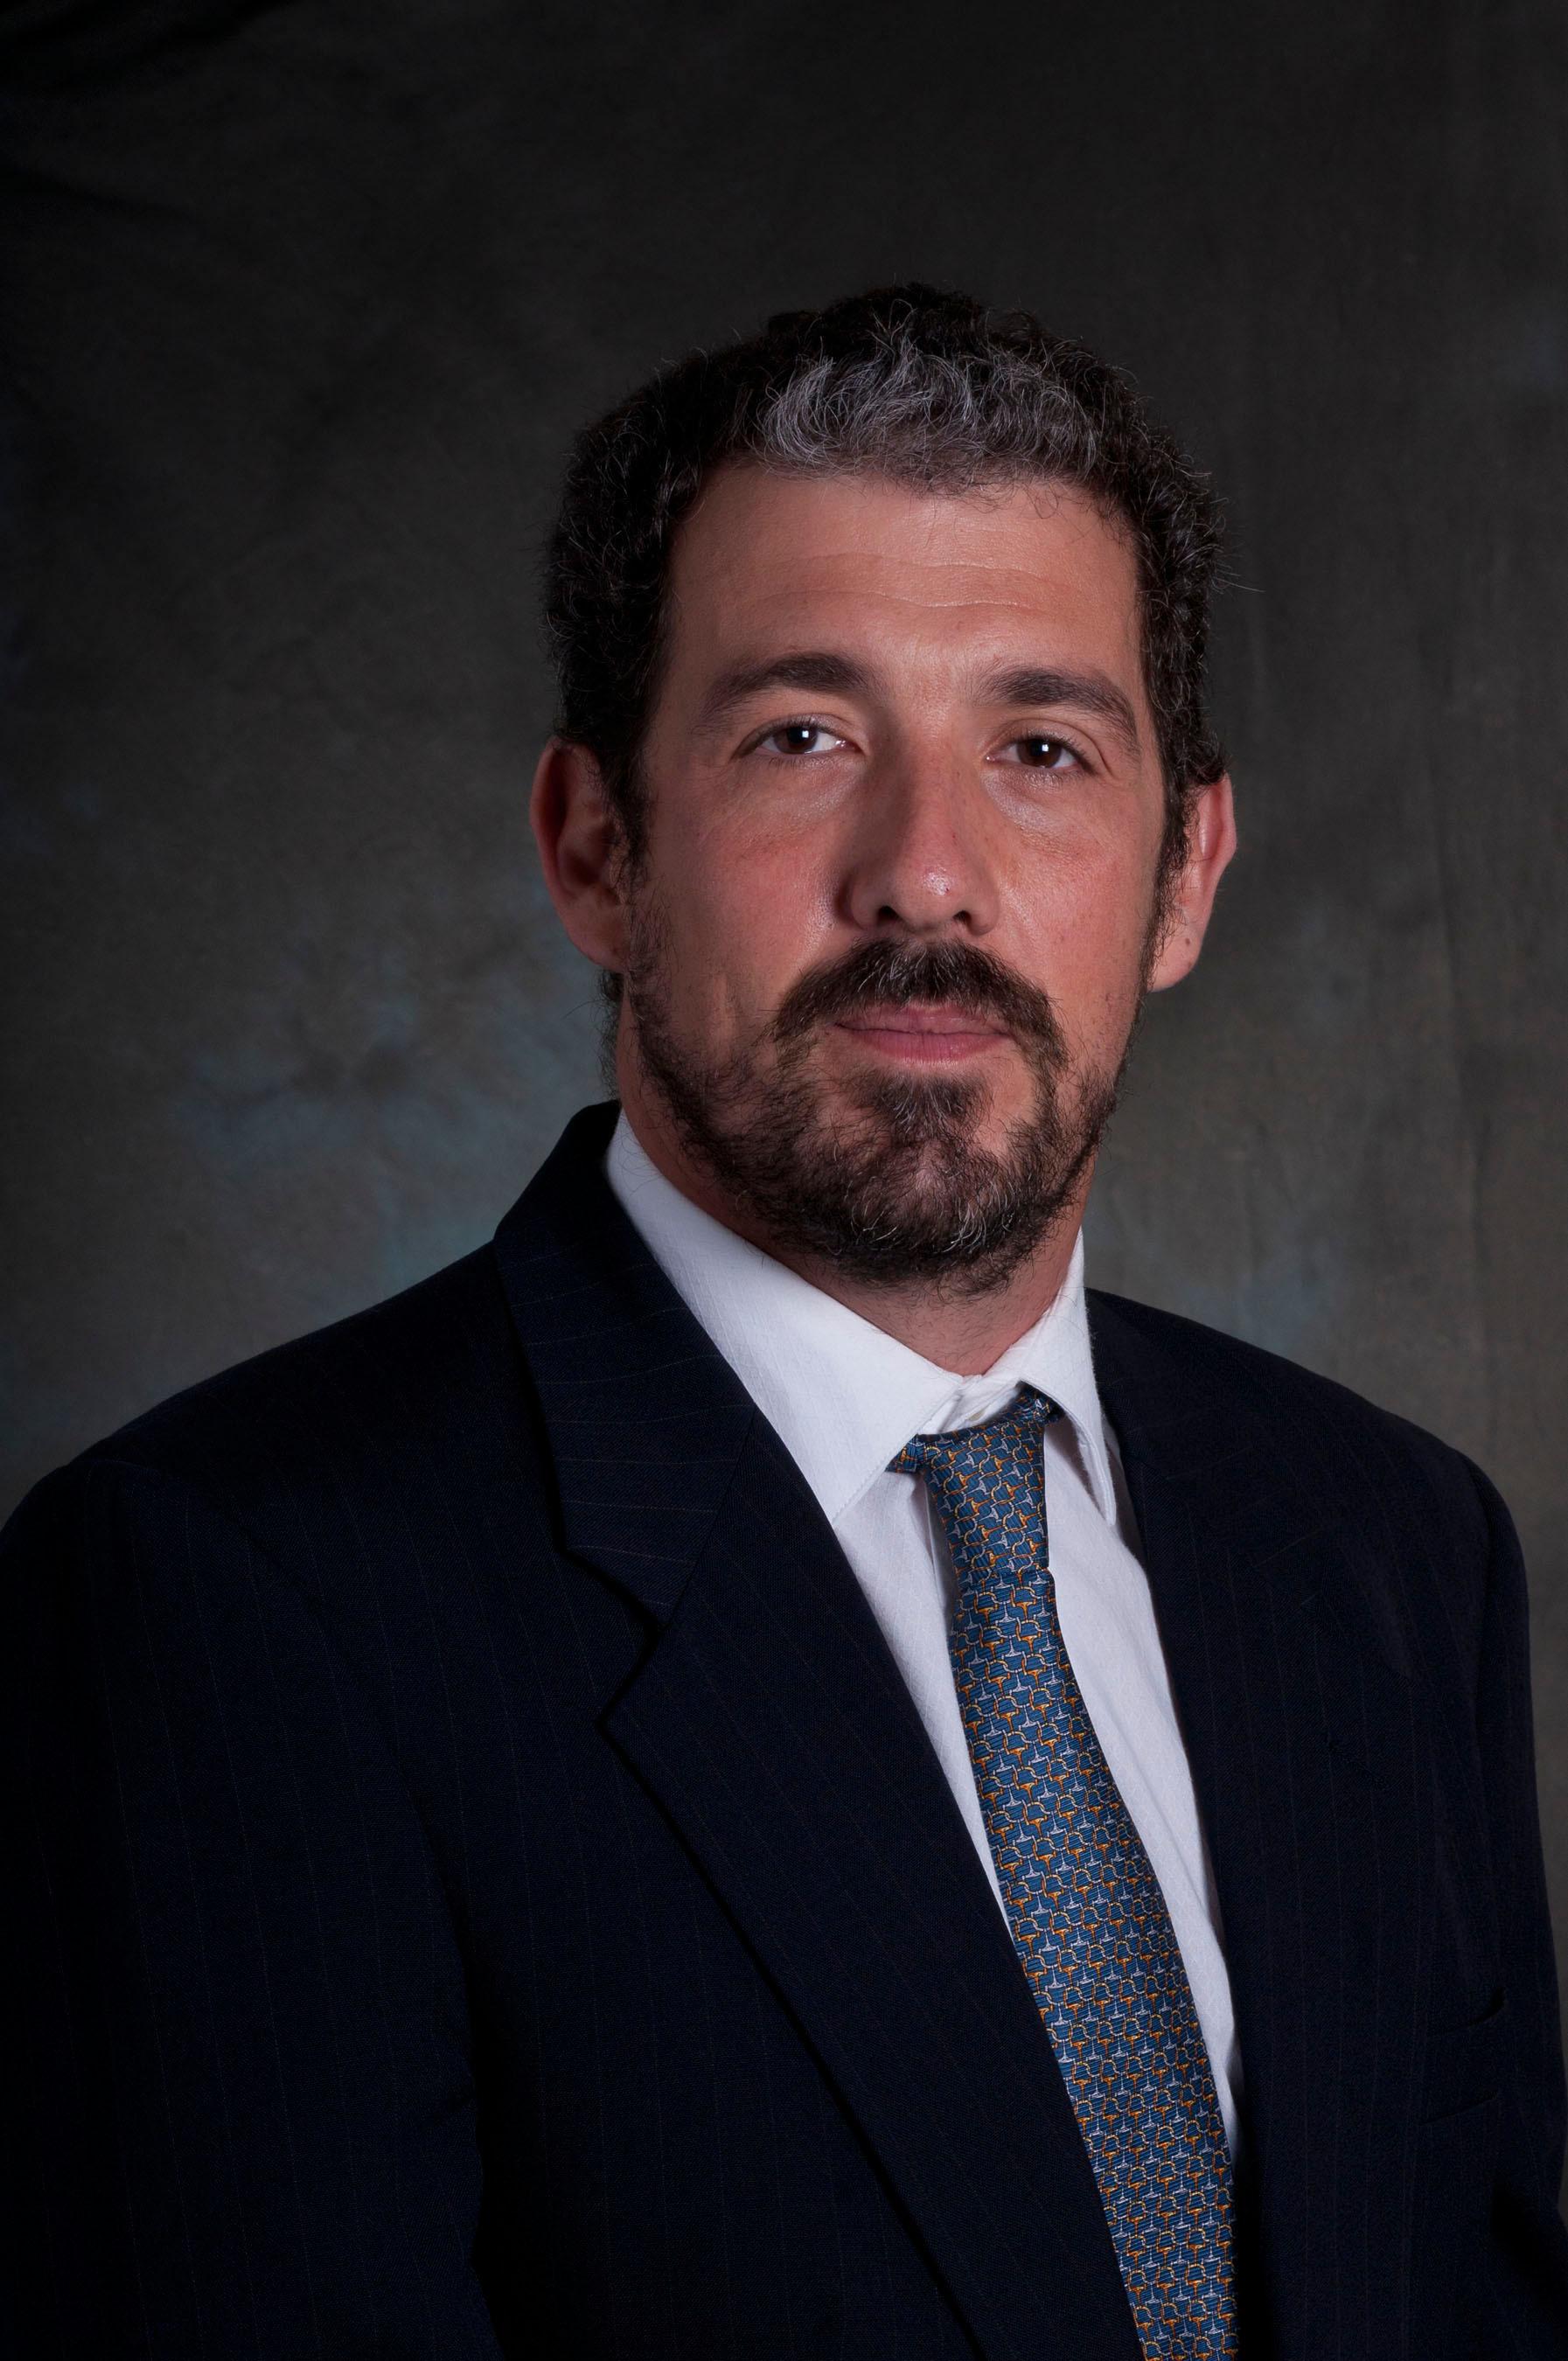 Gonzalo Jalles CEO, Cayman Finance. (PRNewsFoto/Cayman Finance) (PRNewsFoto/CAYMAN FINANCE)